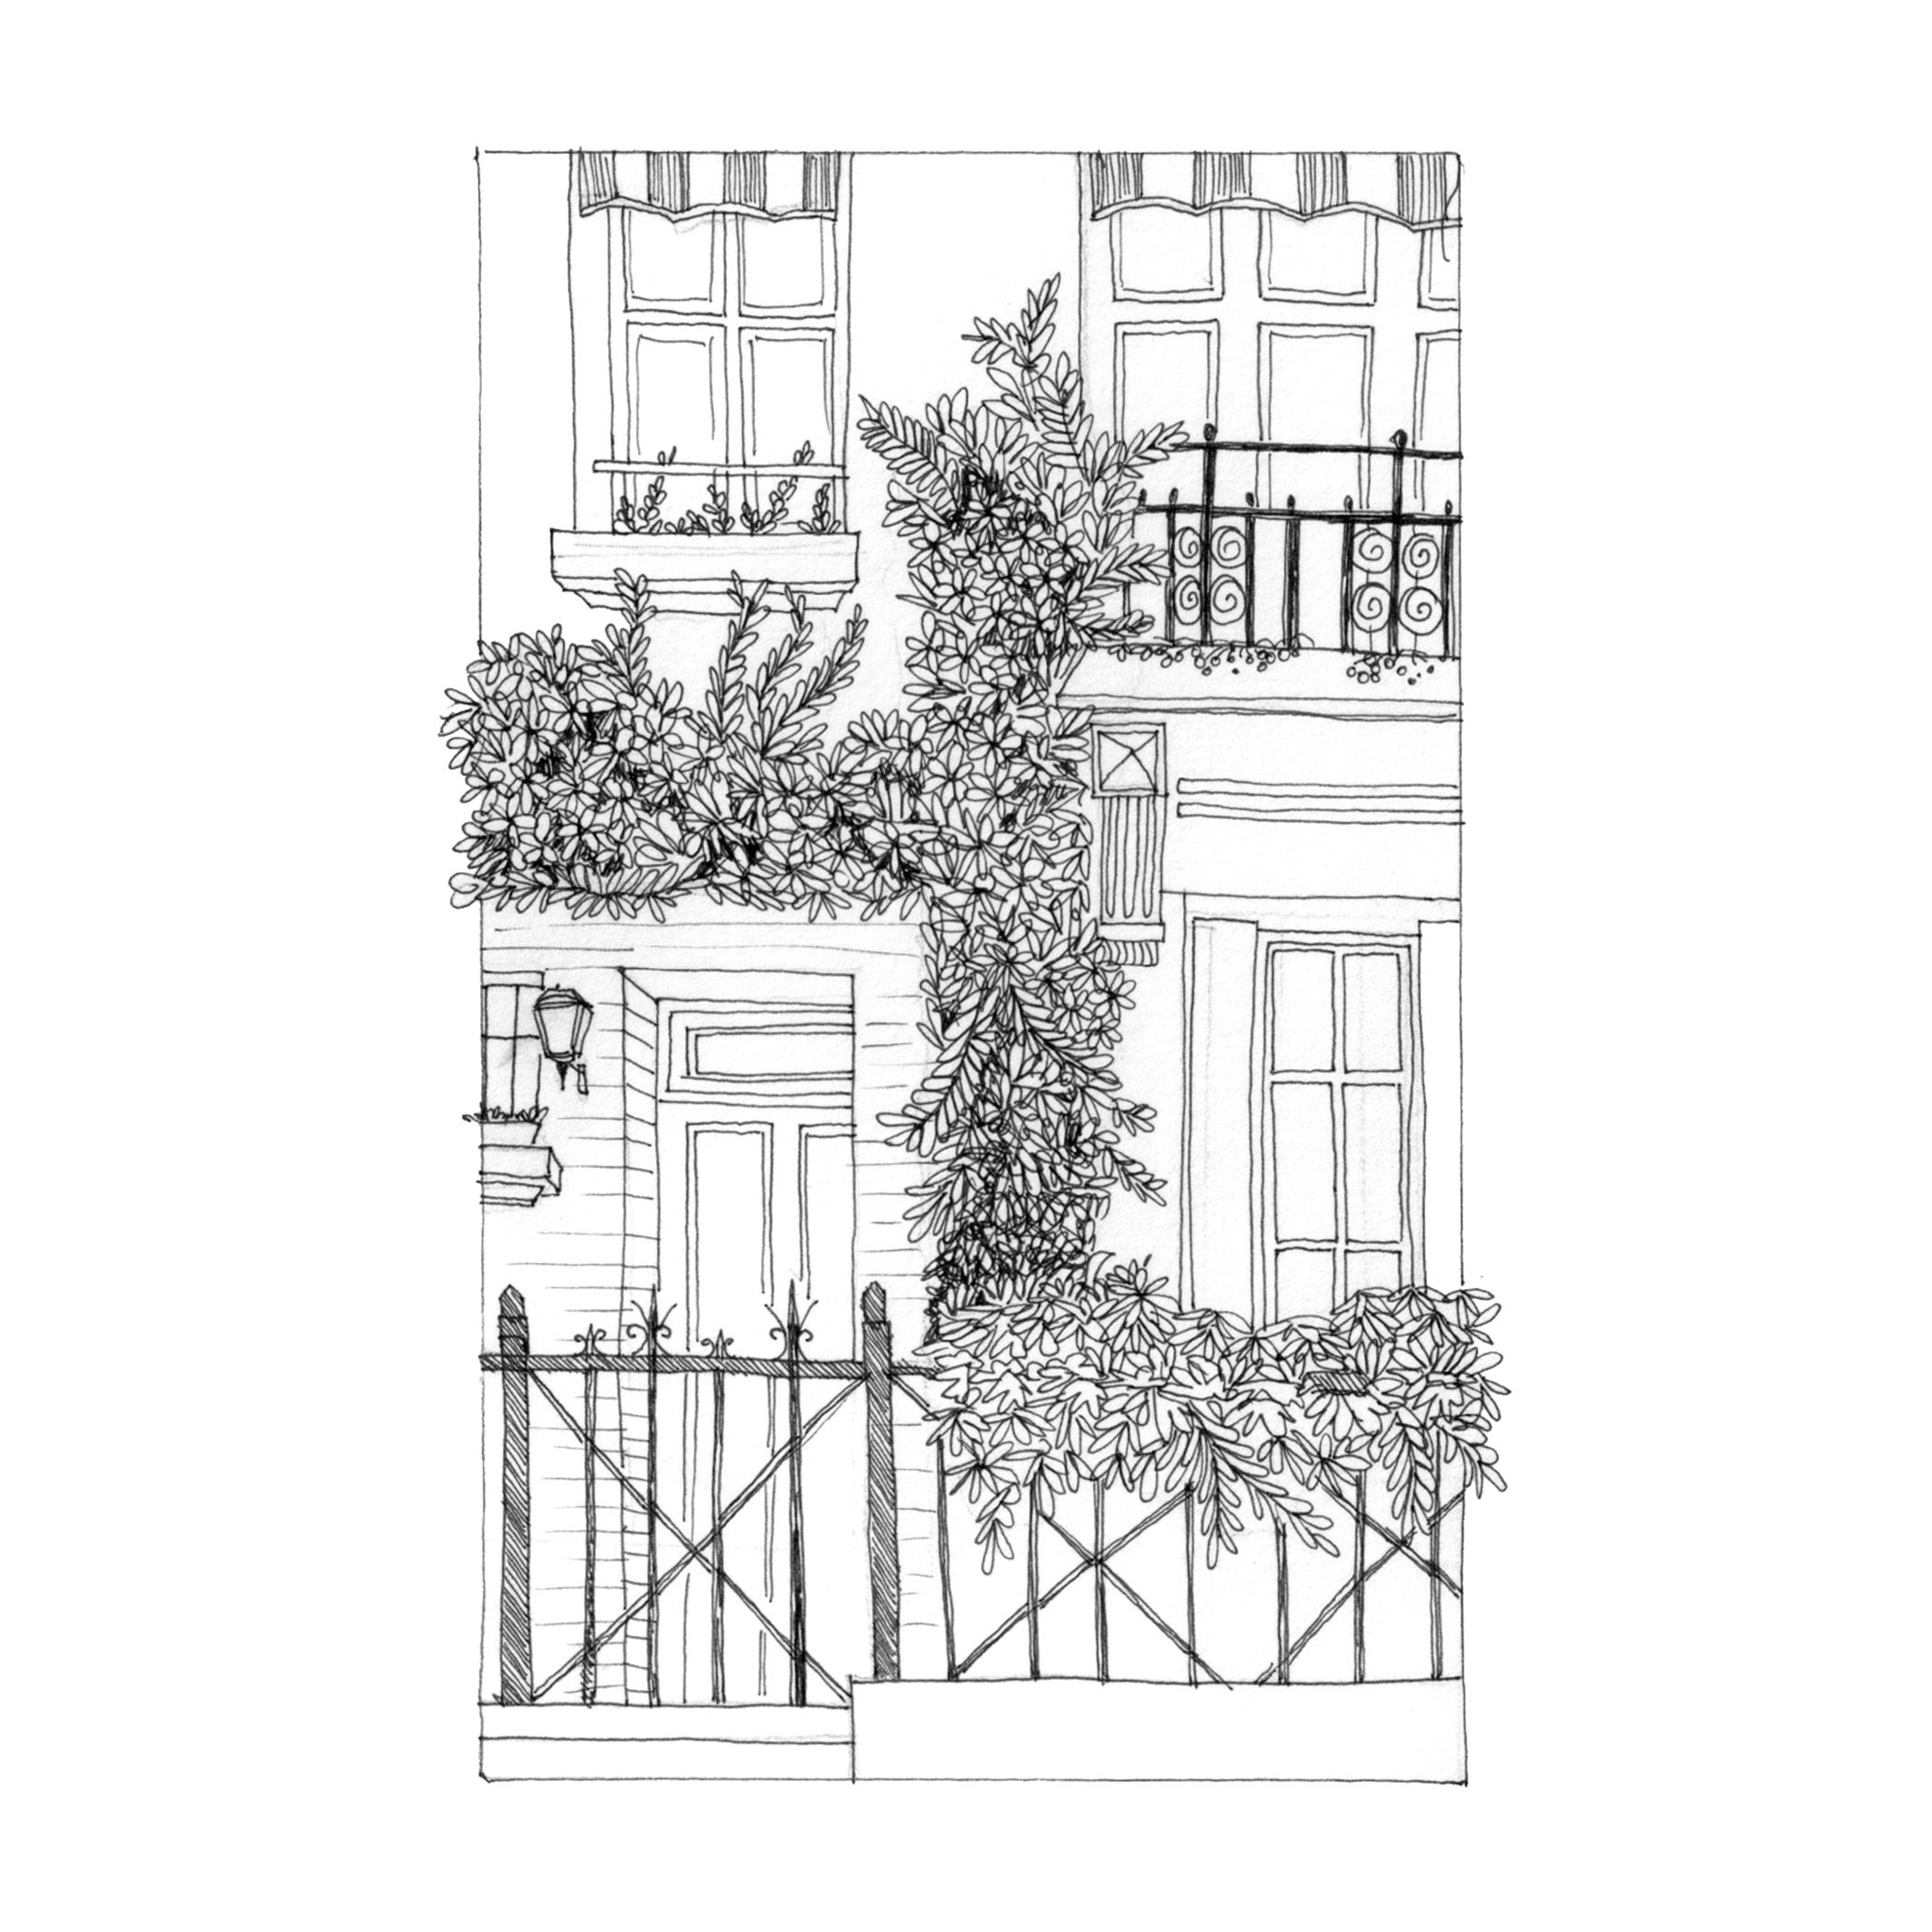 mont marte sketch sqaure.jpg